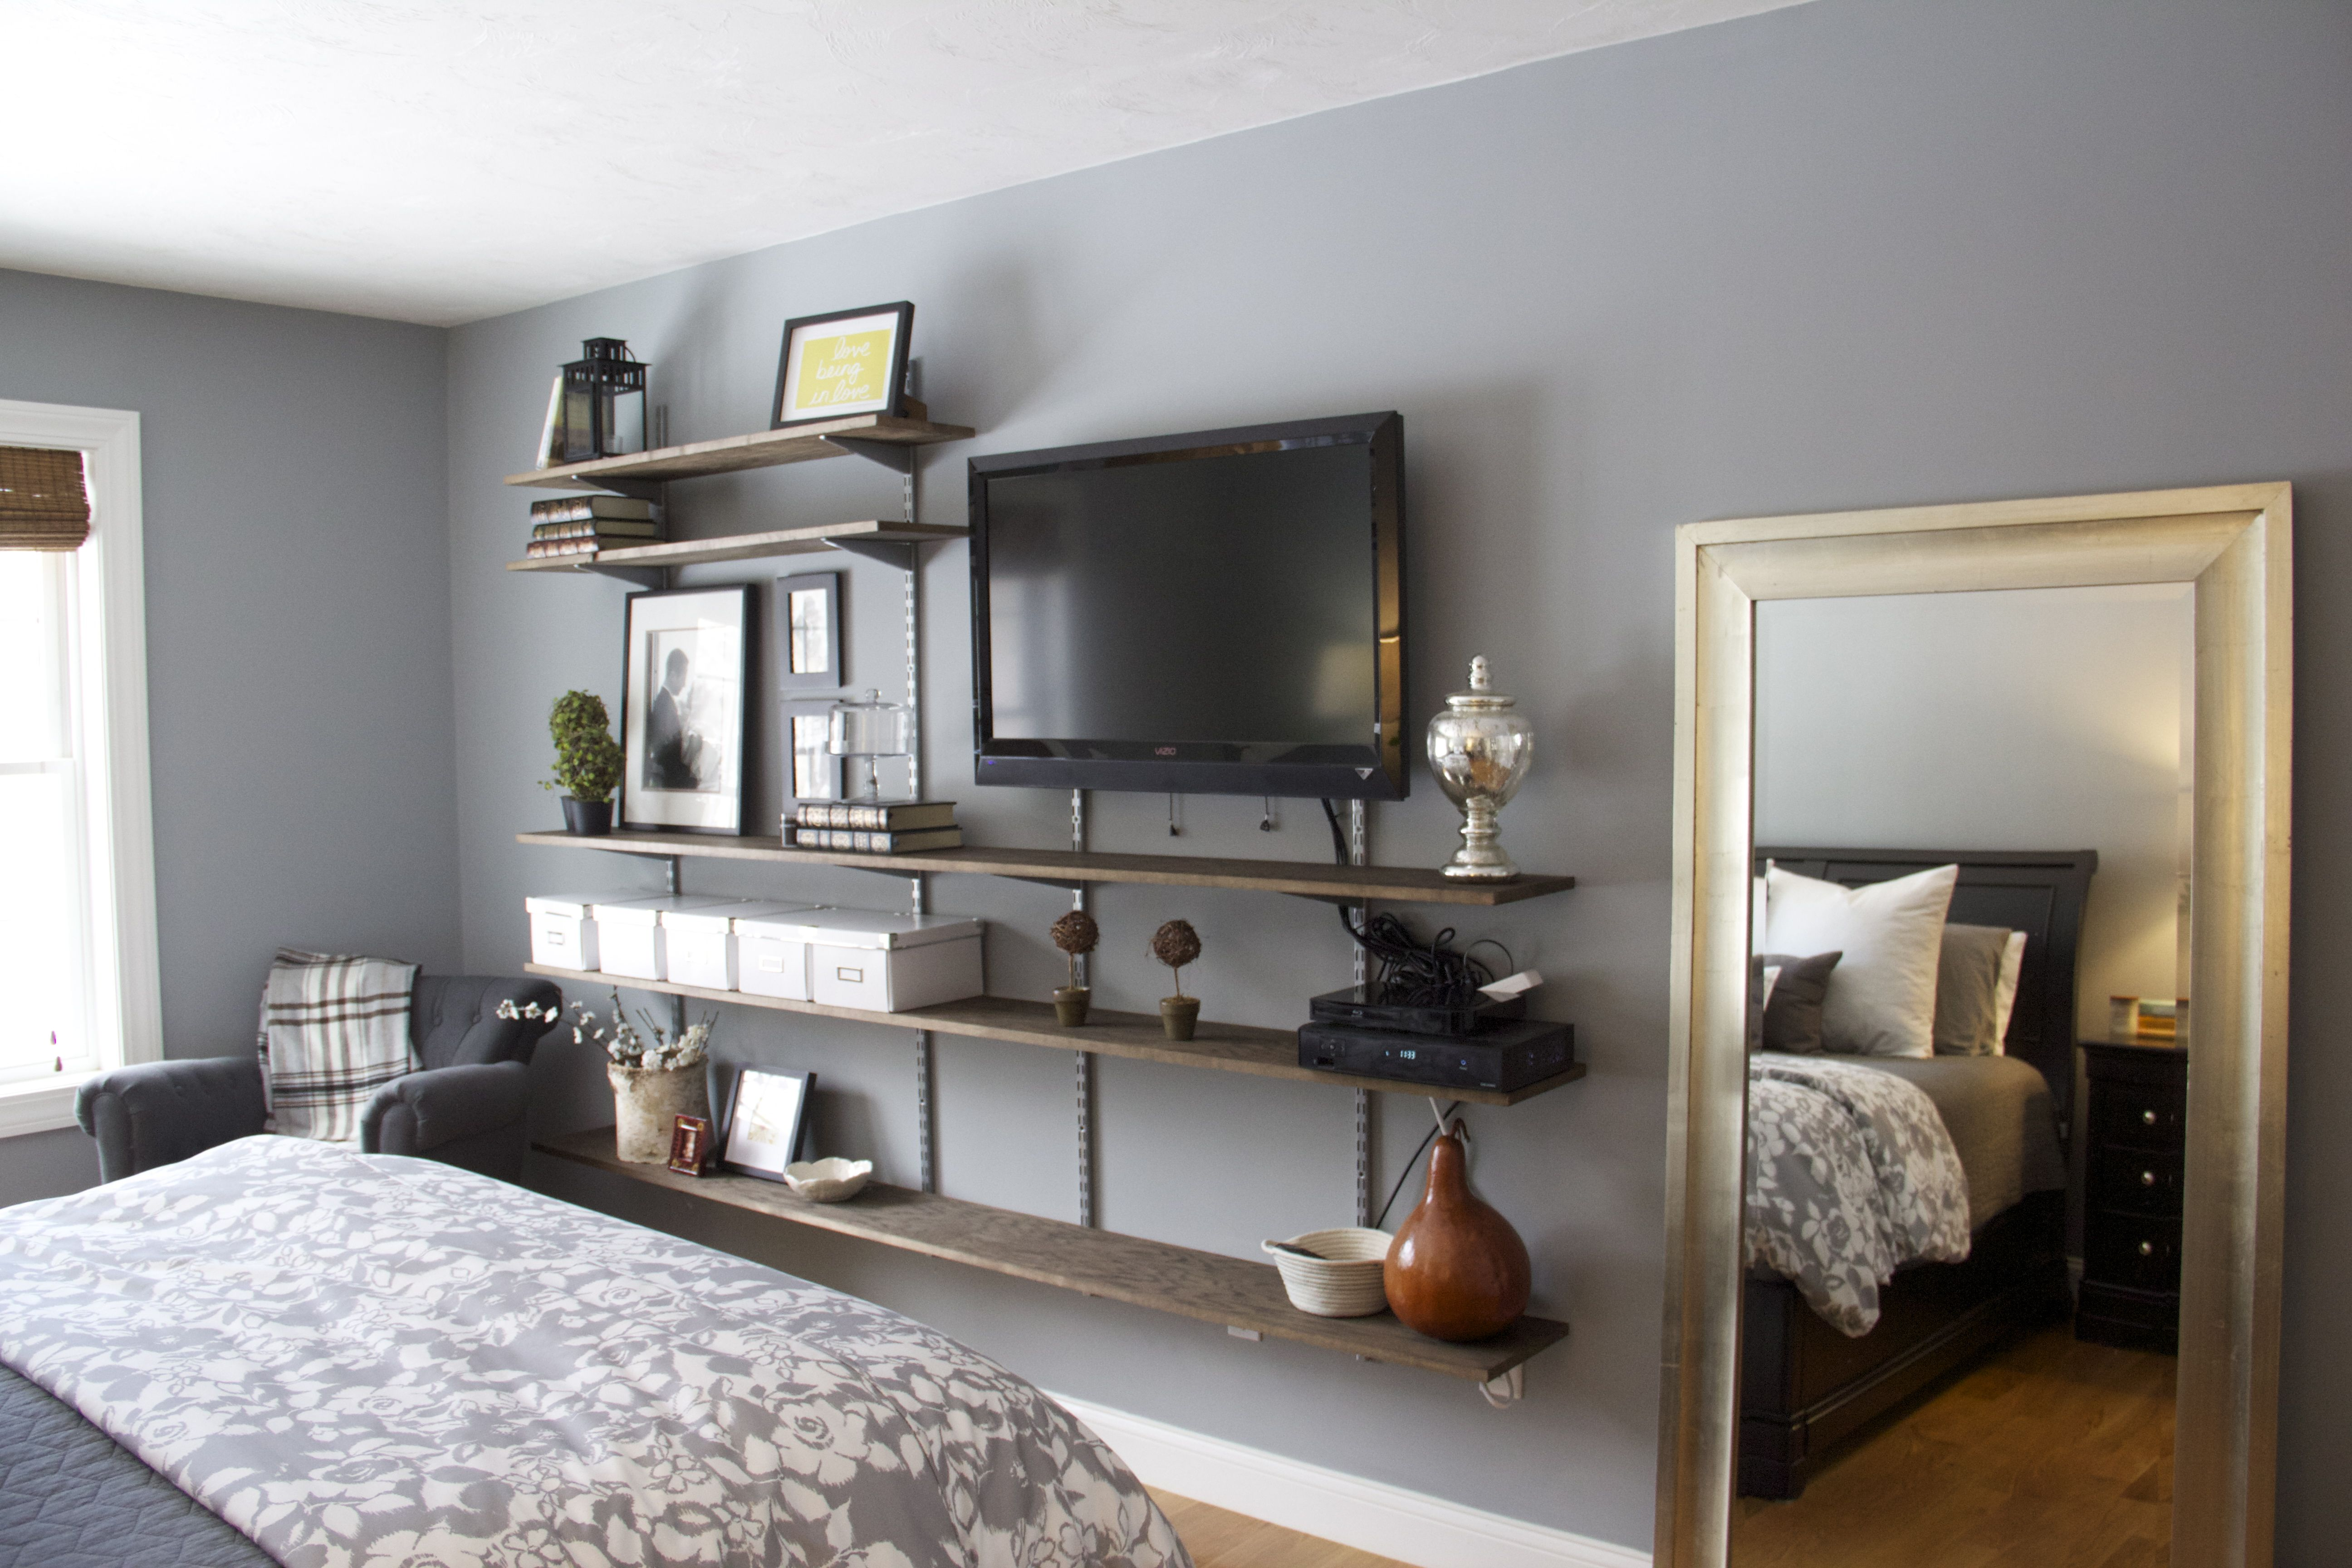 Pin by Rhea Krol on {CLEAN & ORGANIZE.} in 2019 | Bedroom tv ...